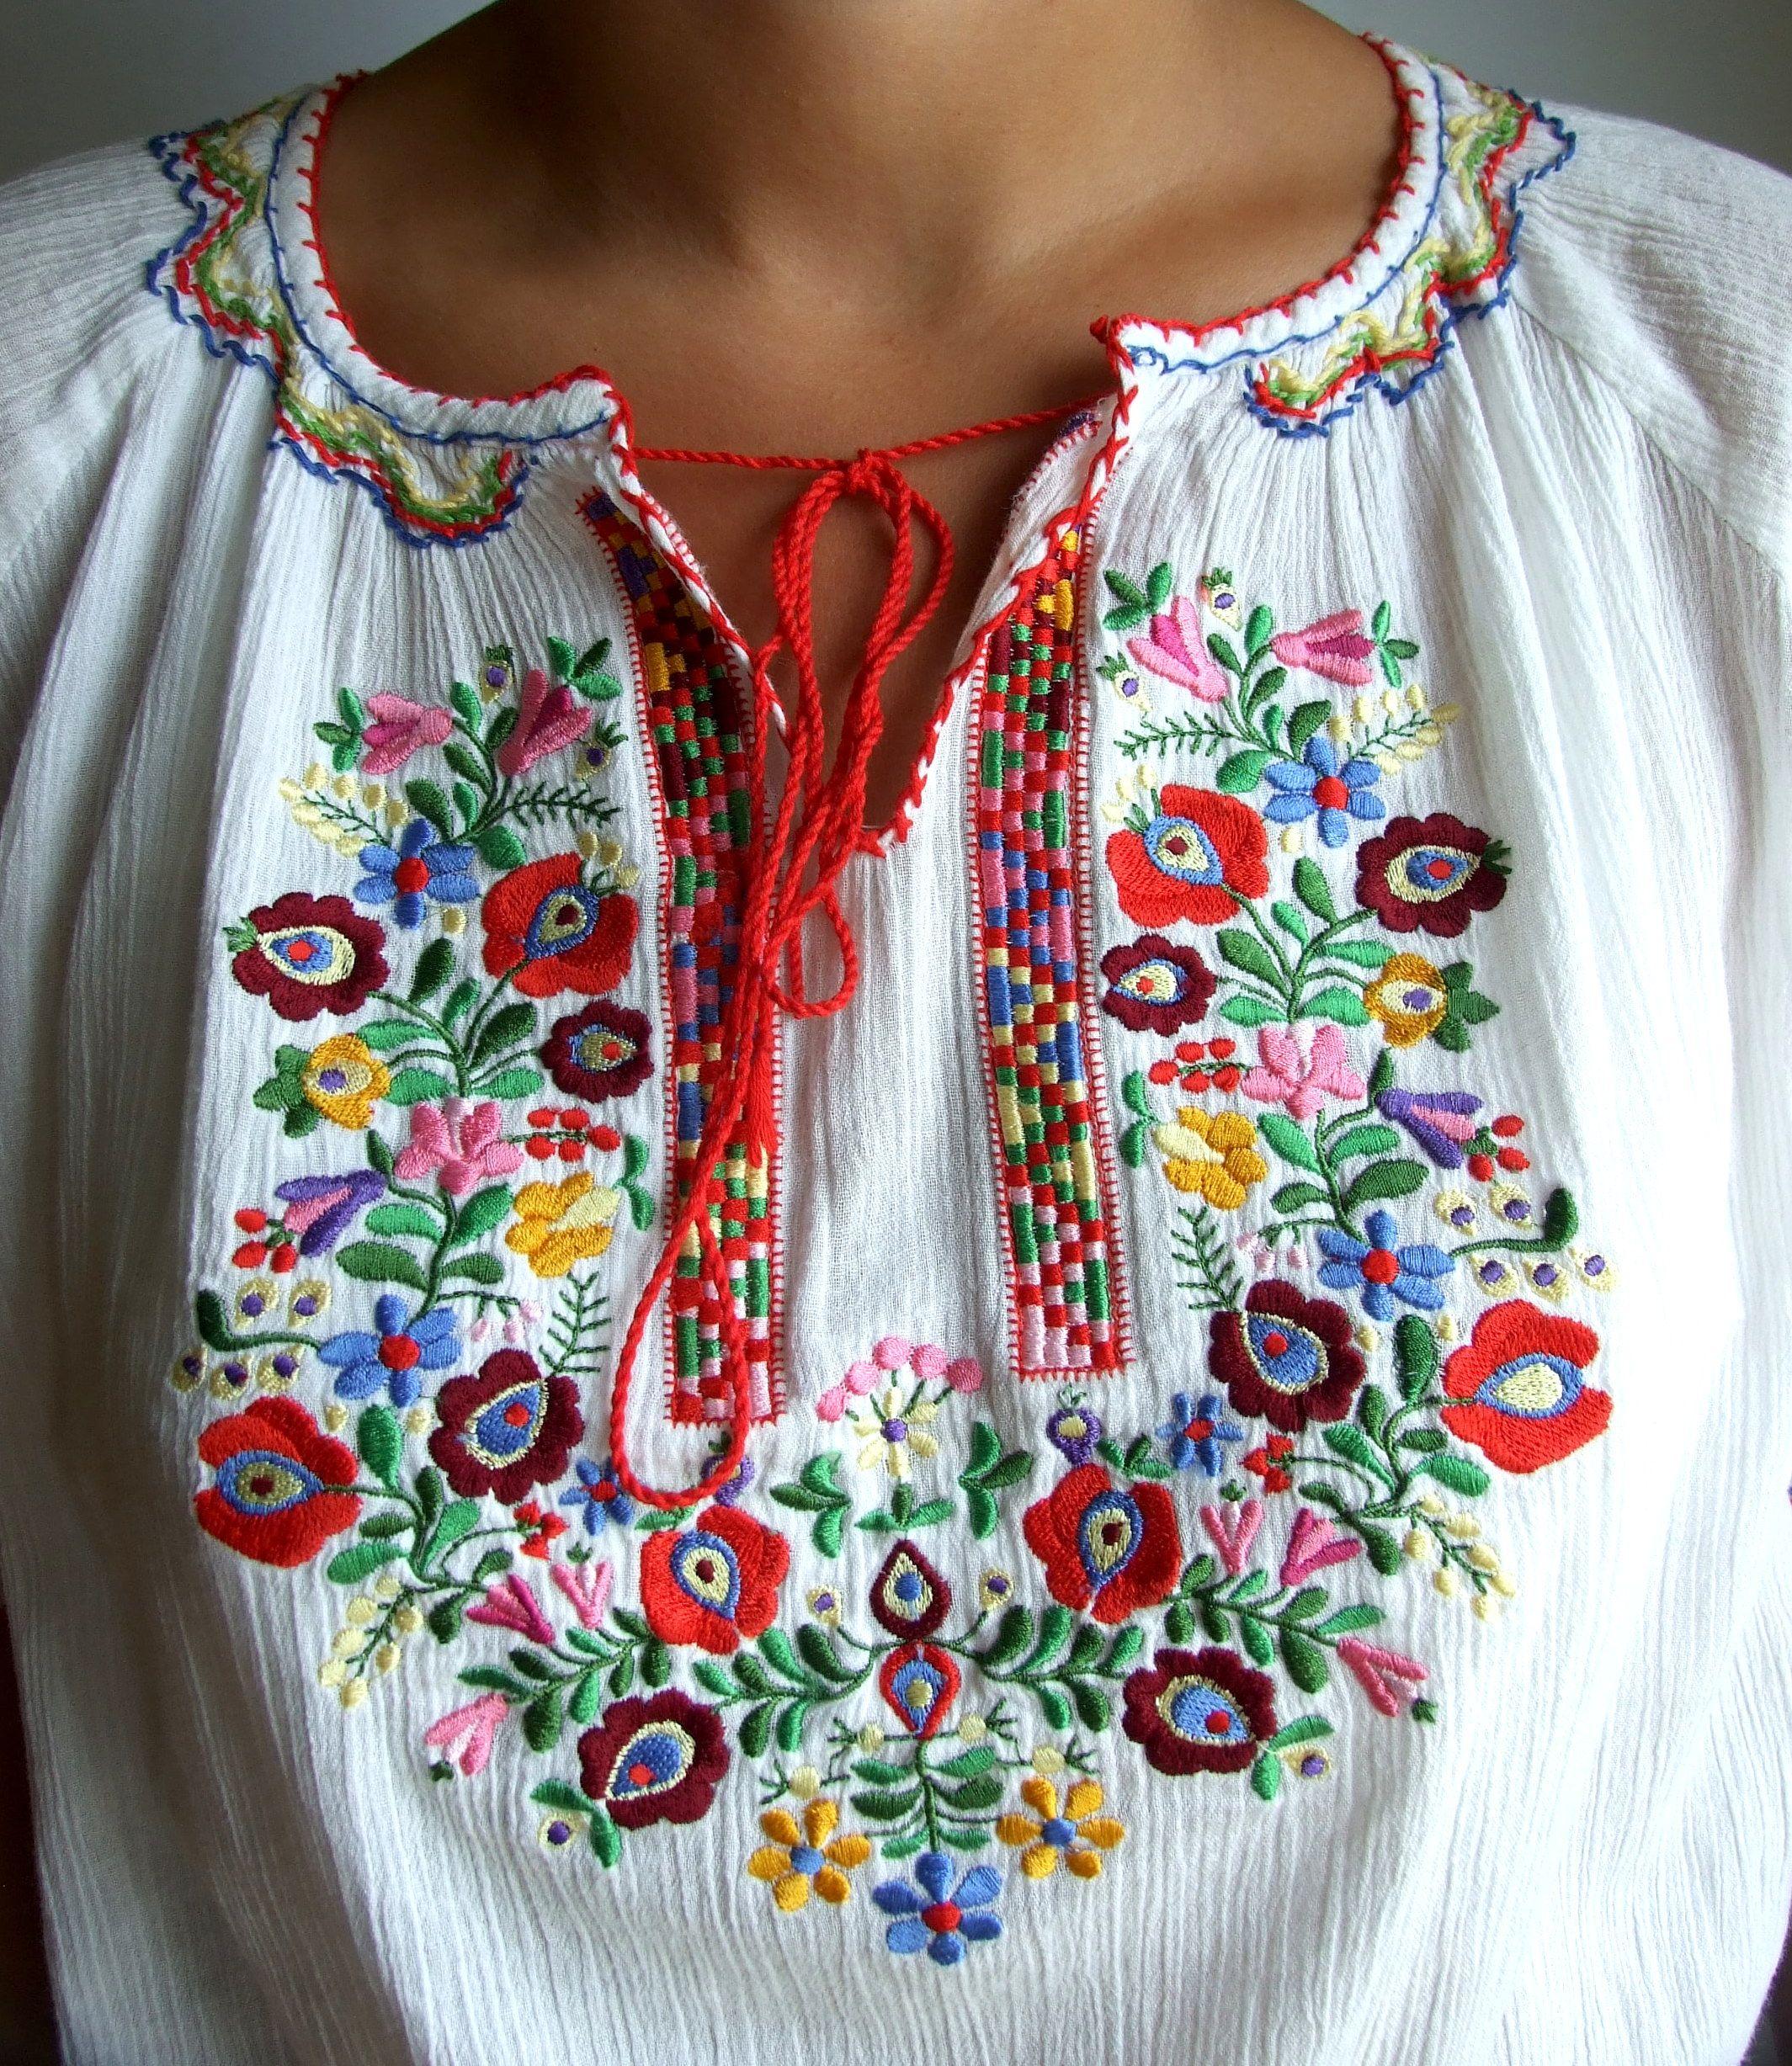 Cashmere Silk Scarf - Embroidery by VIDA VIDA adKeHxIm